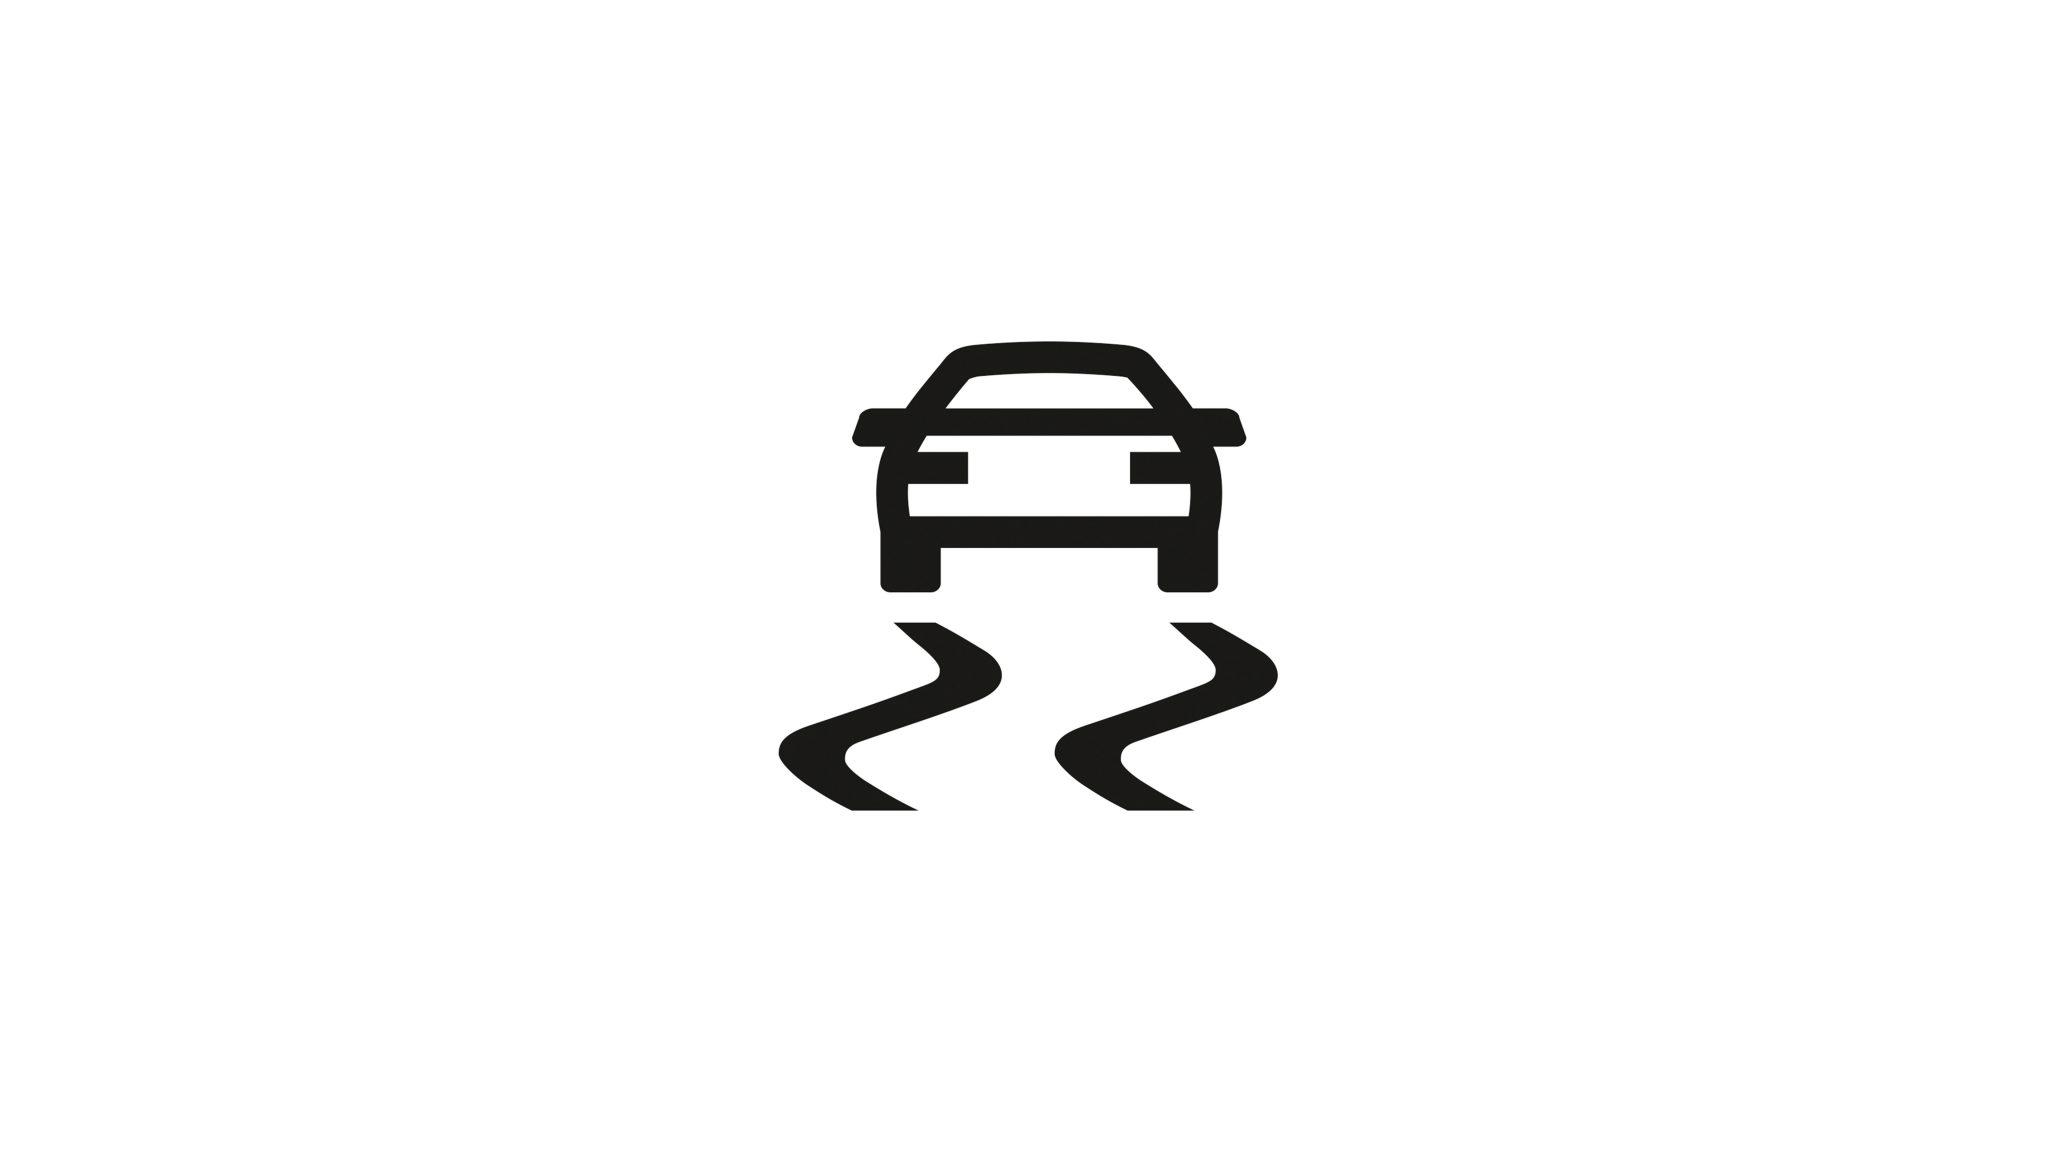 ESC комплексная система безопасности Volkswagen Crafter